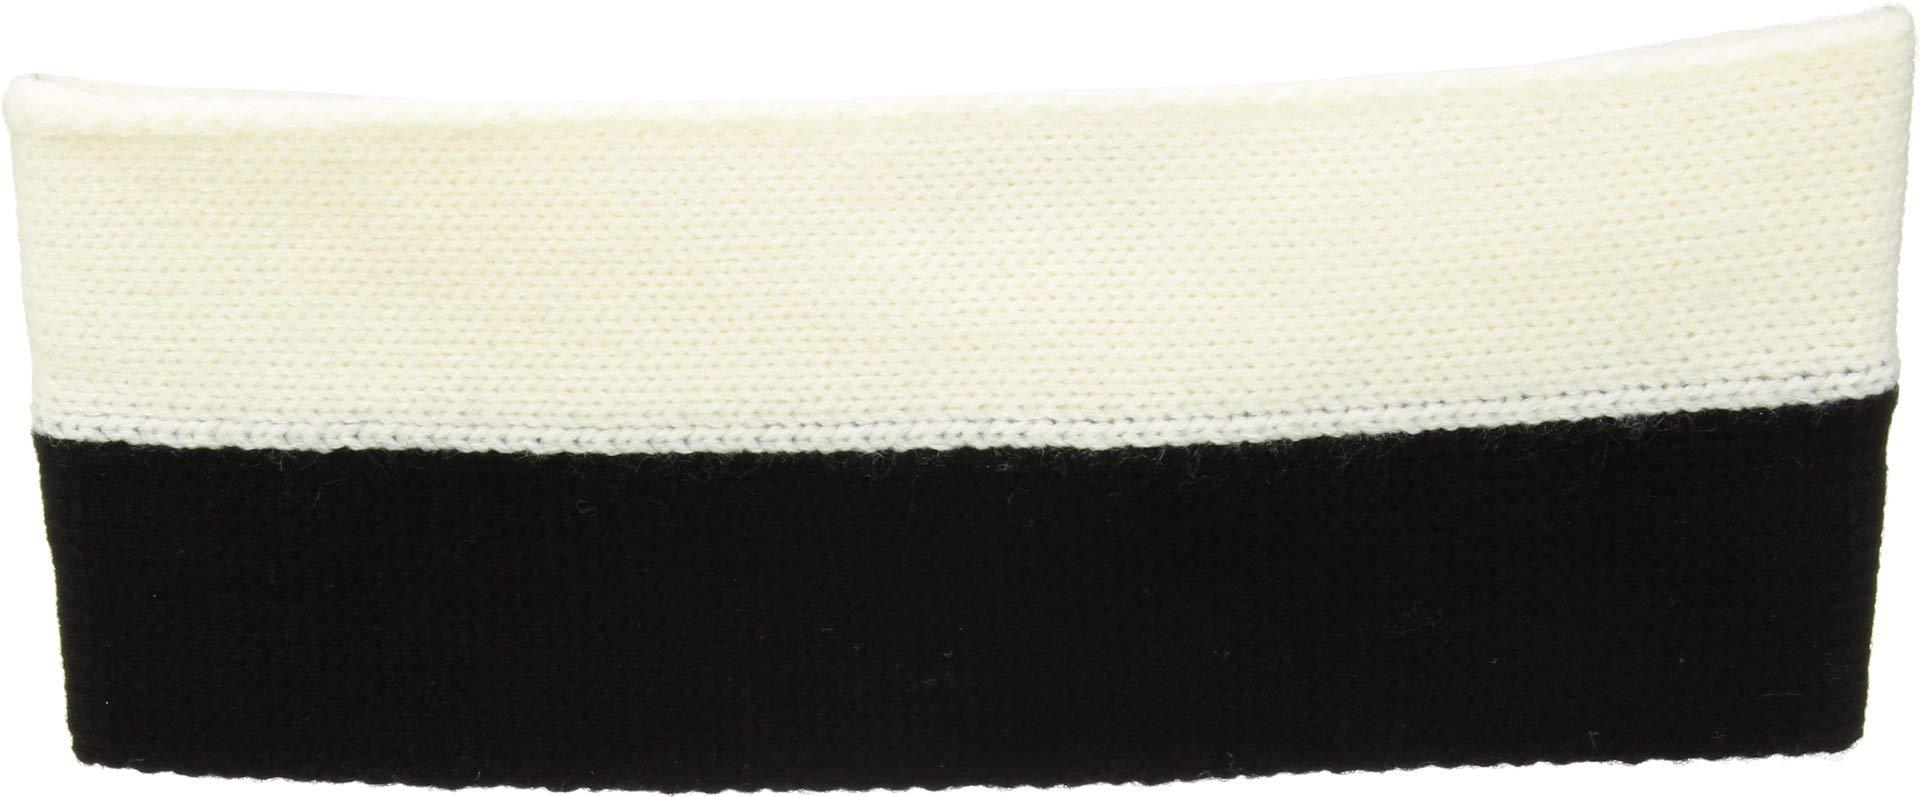 Kate Spade New York Women's Striped Headband, Black/Cream, One Size by Kate Spade New York (Image #2)